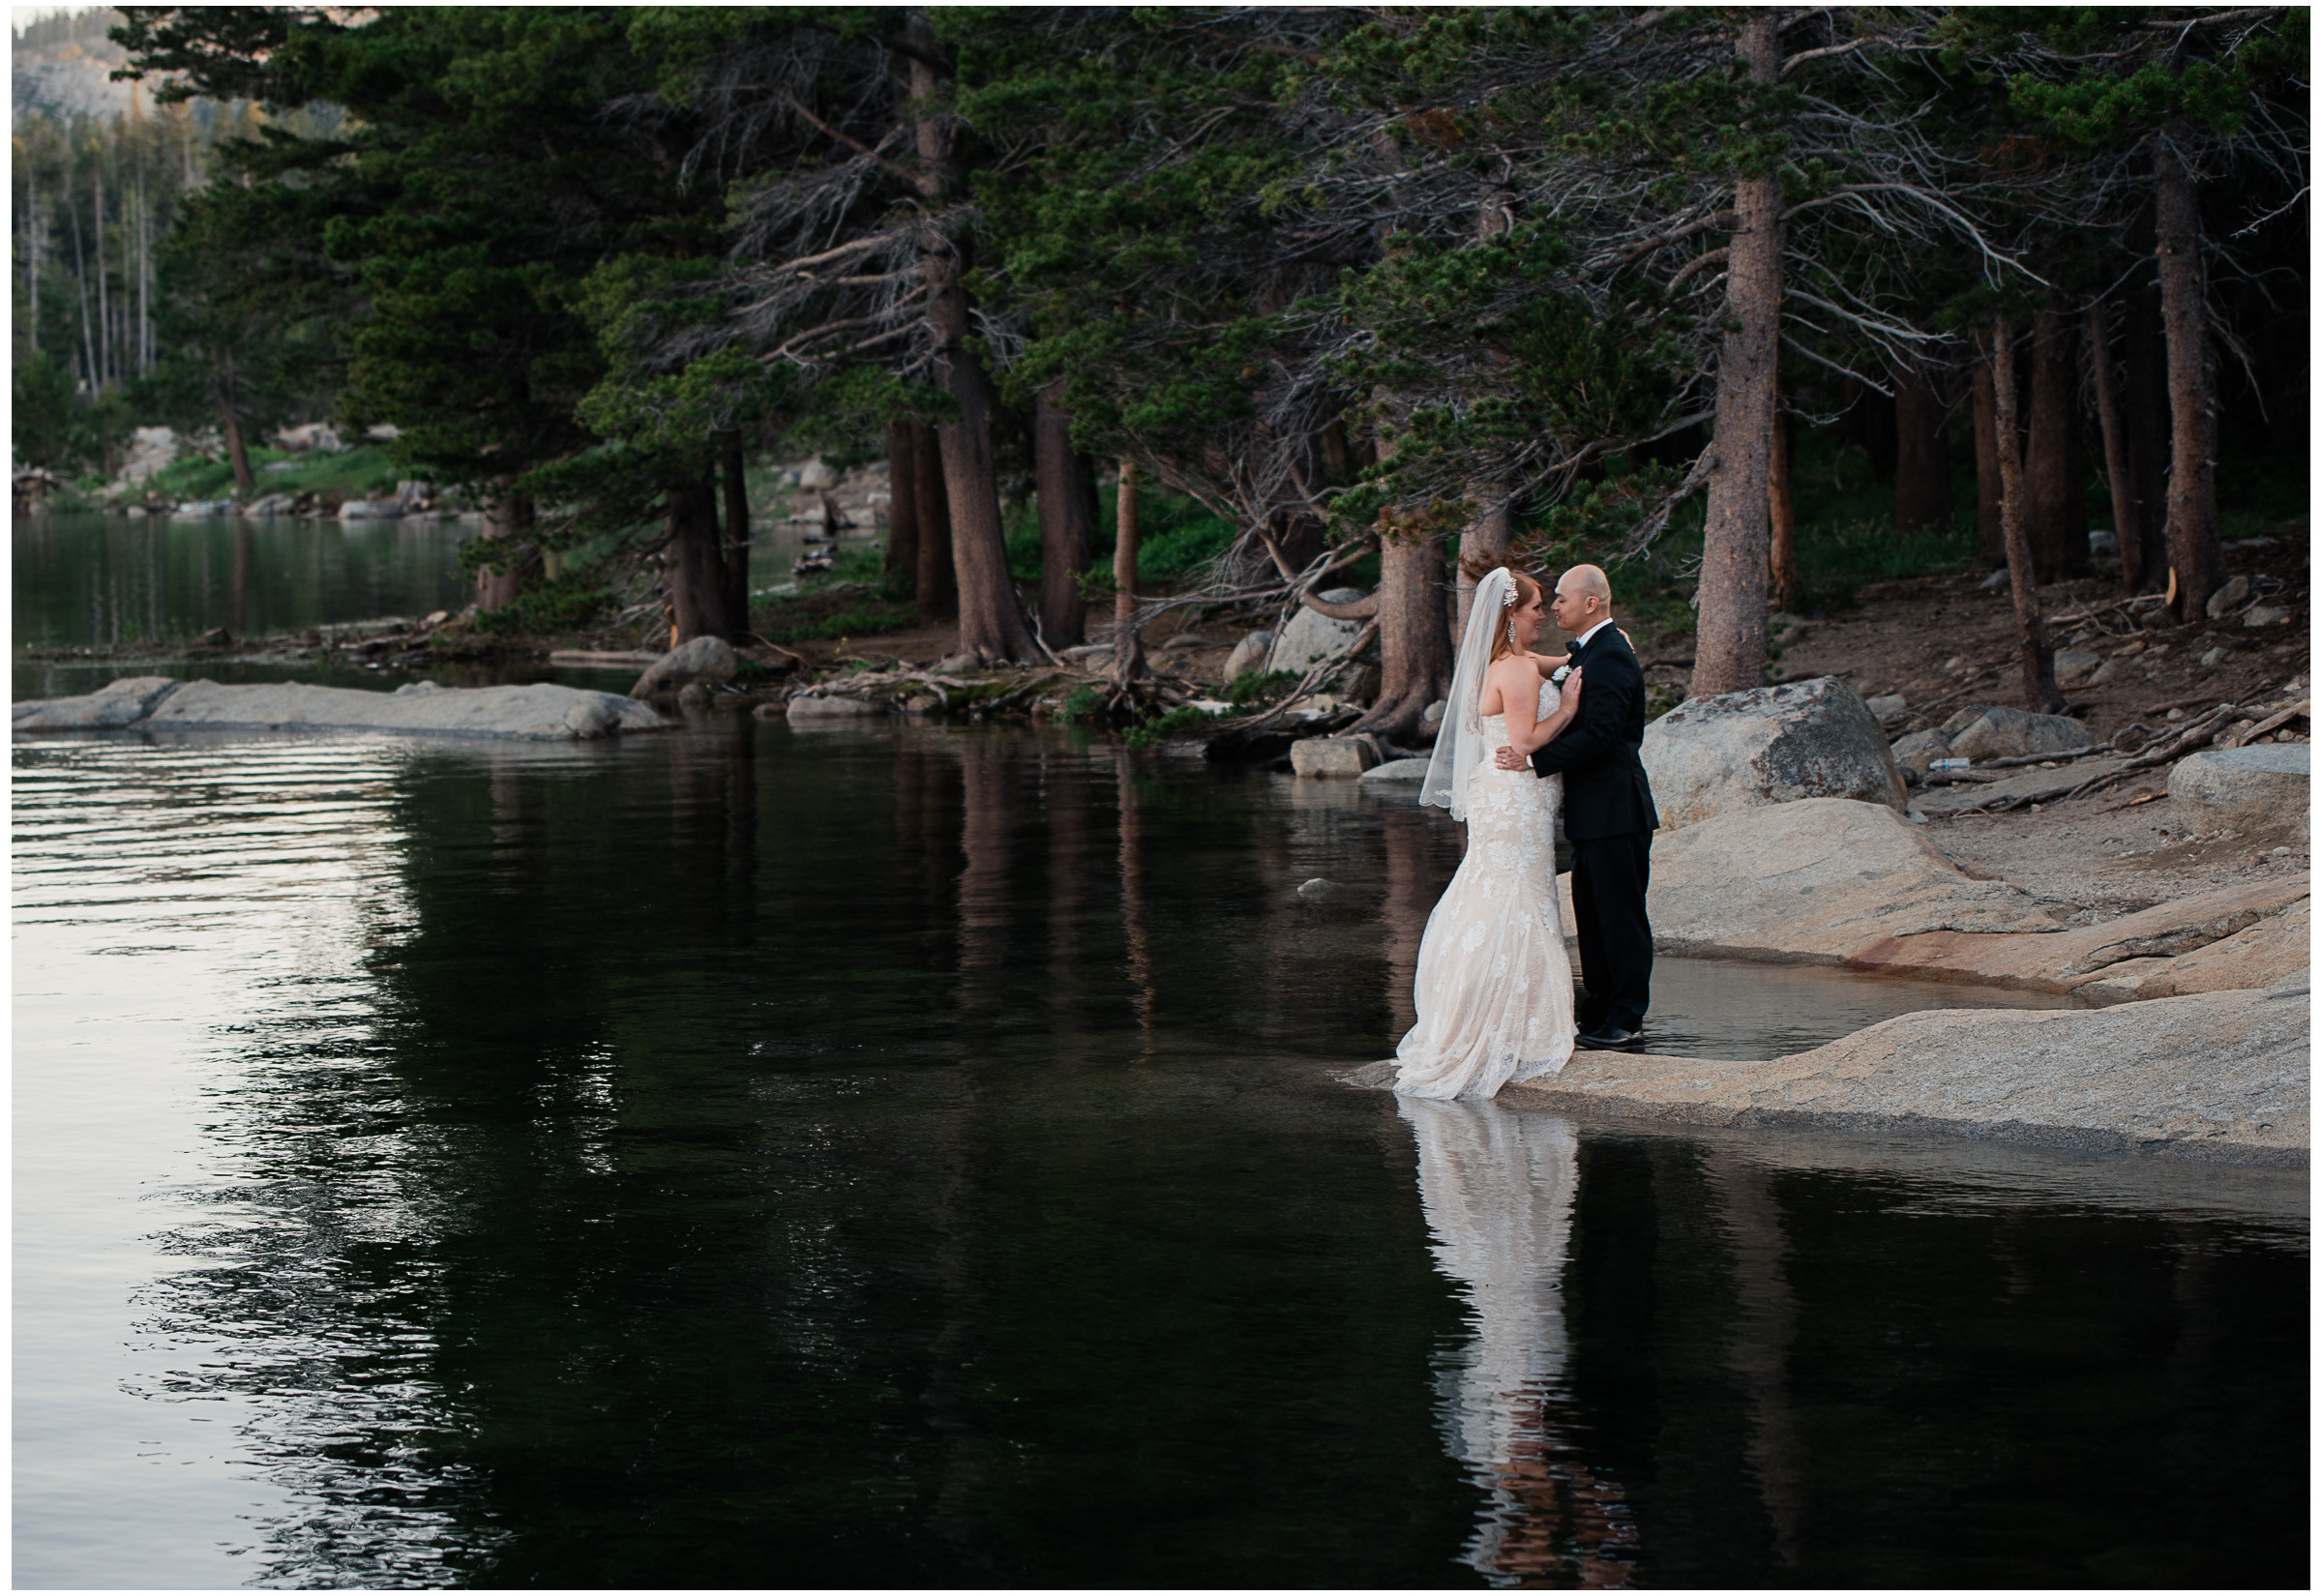 Clarksburg Wedding - Sacramento Photographer - Bogle Winery - Justin Wilcox Photography - 12.jpg